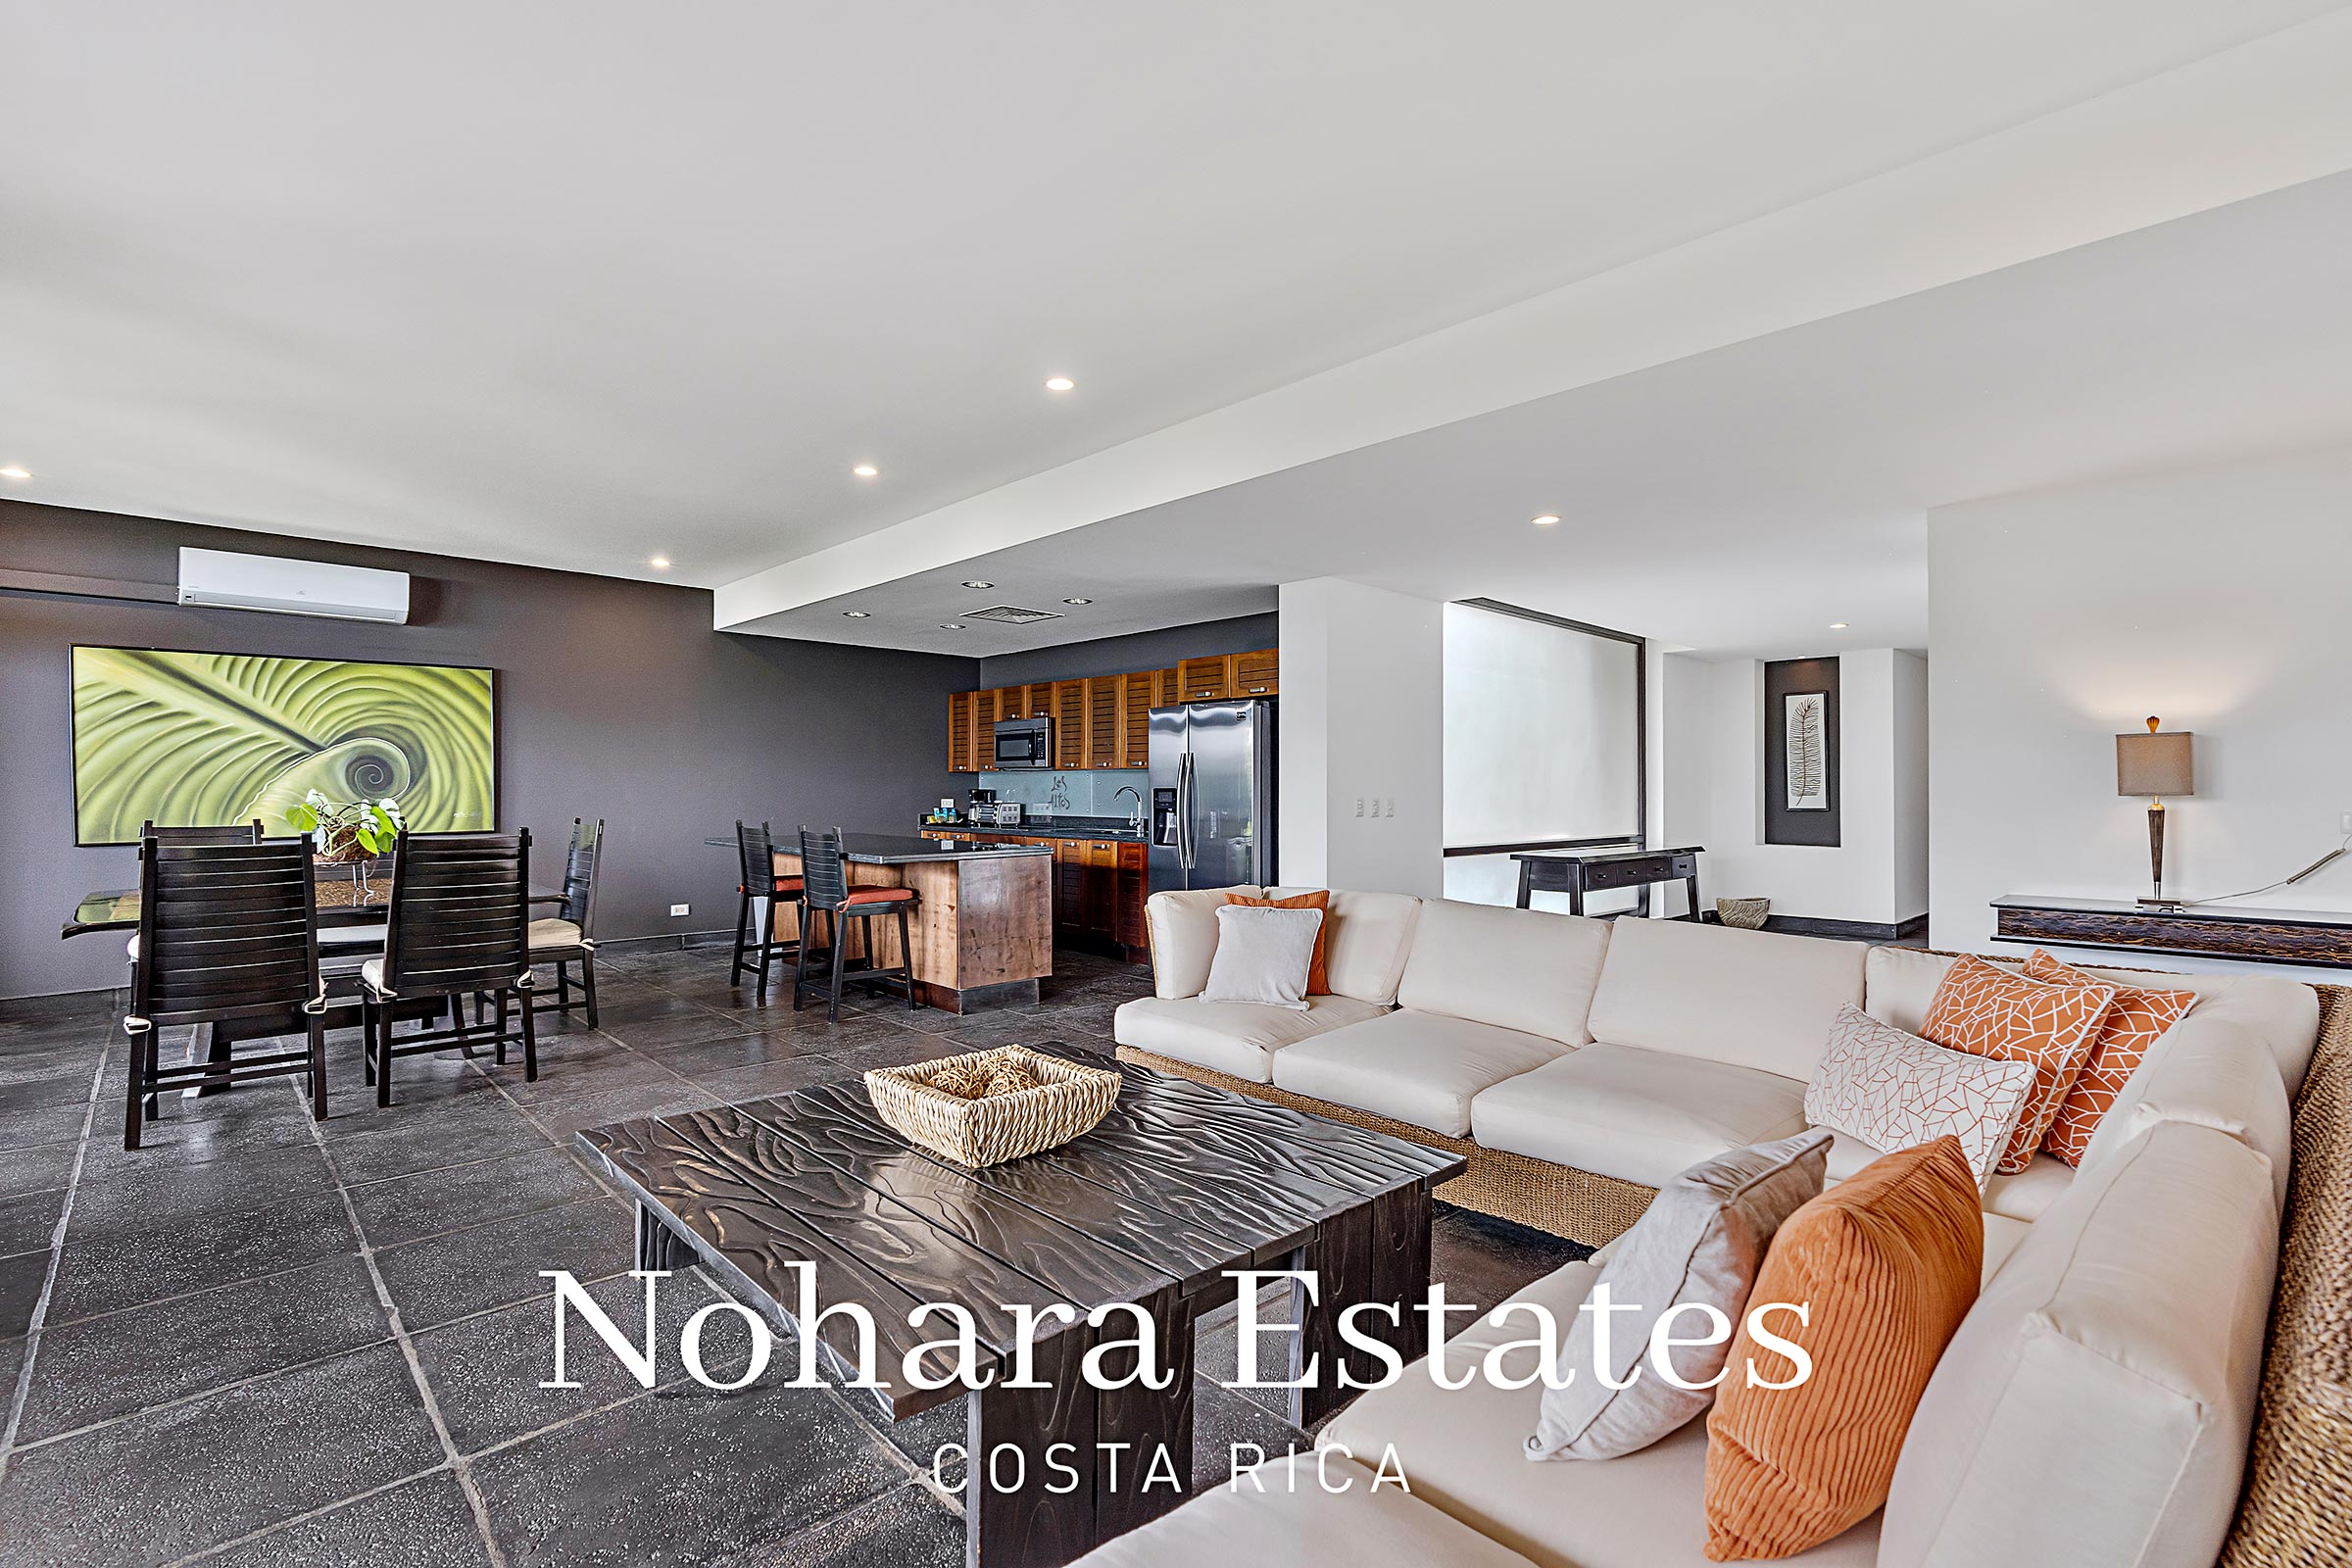 Nohara Estates Costa Rica 128 Penthouse Quepos Los Altos 22